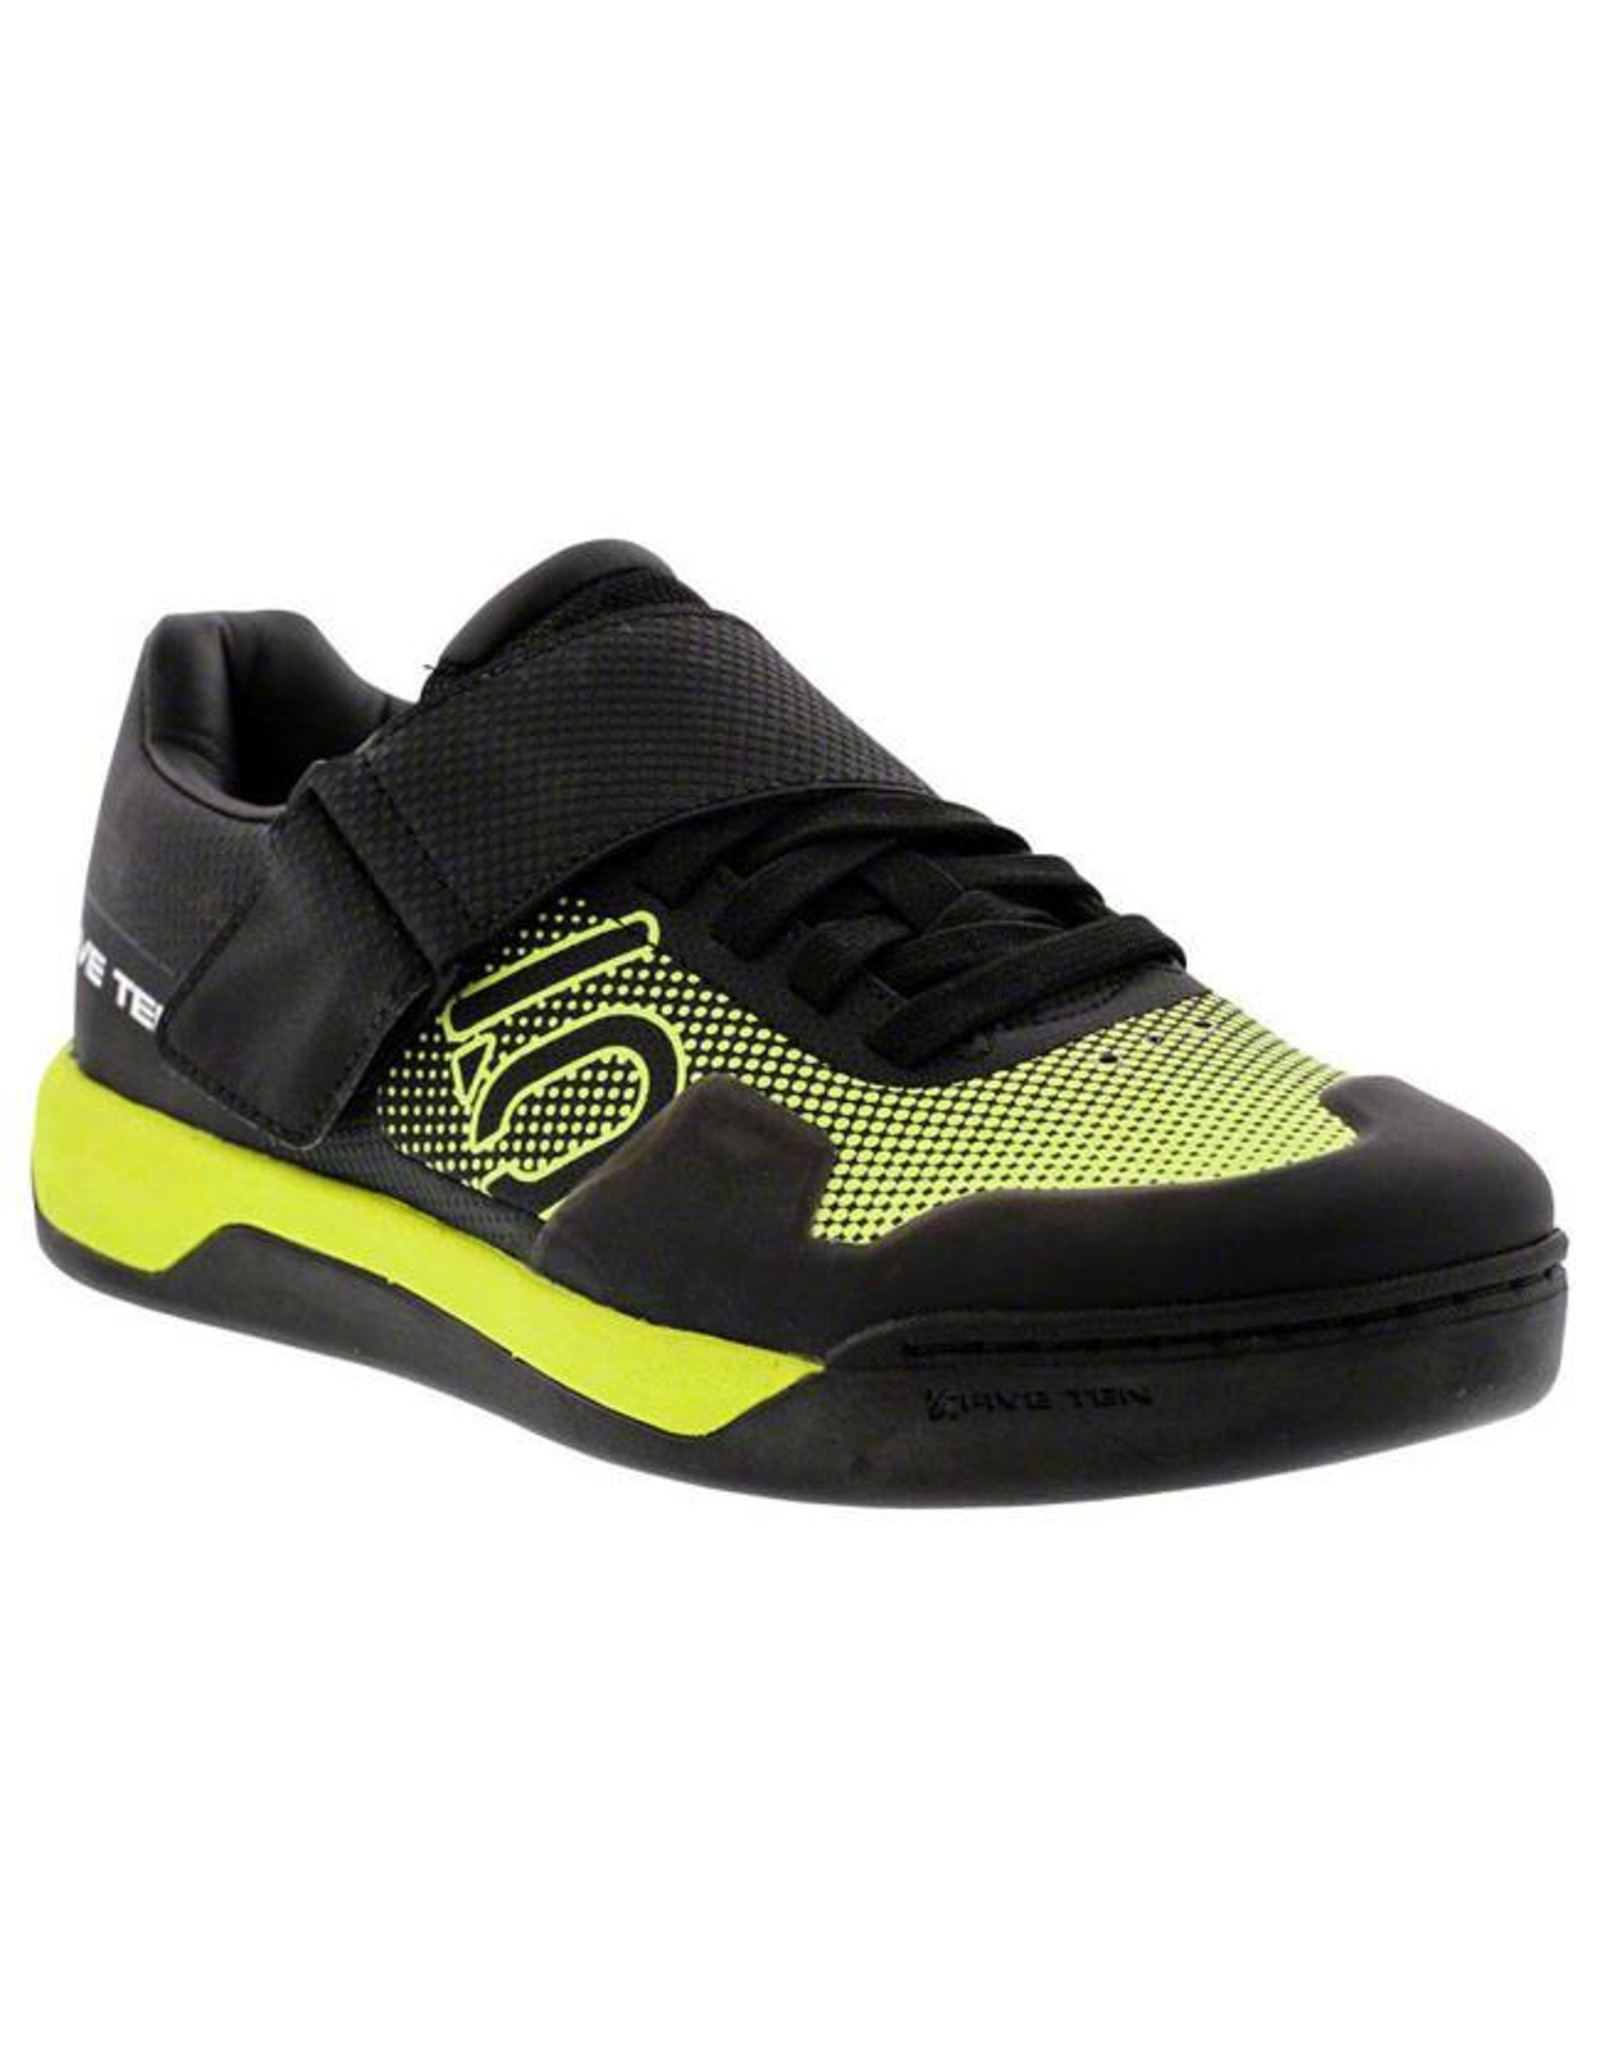 Five Ten Five Ten Hellcat Pro Men's Clipless/Flat Pedal Shoe: Semi Solar Yellow 11